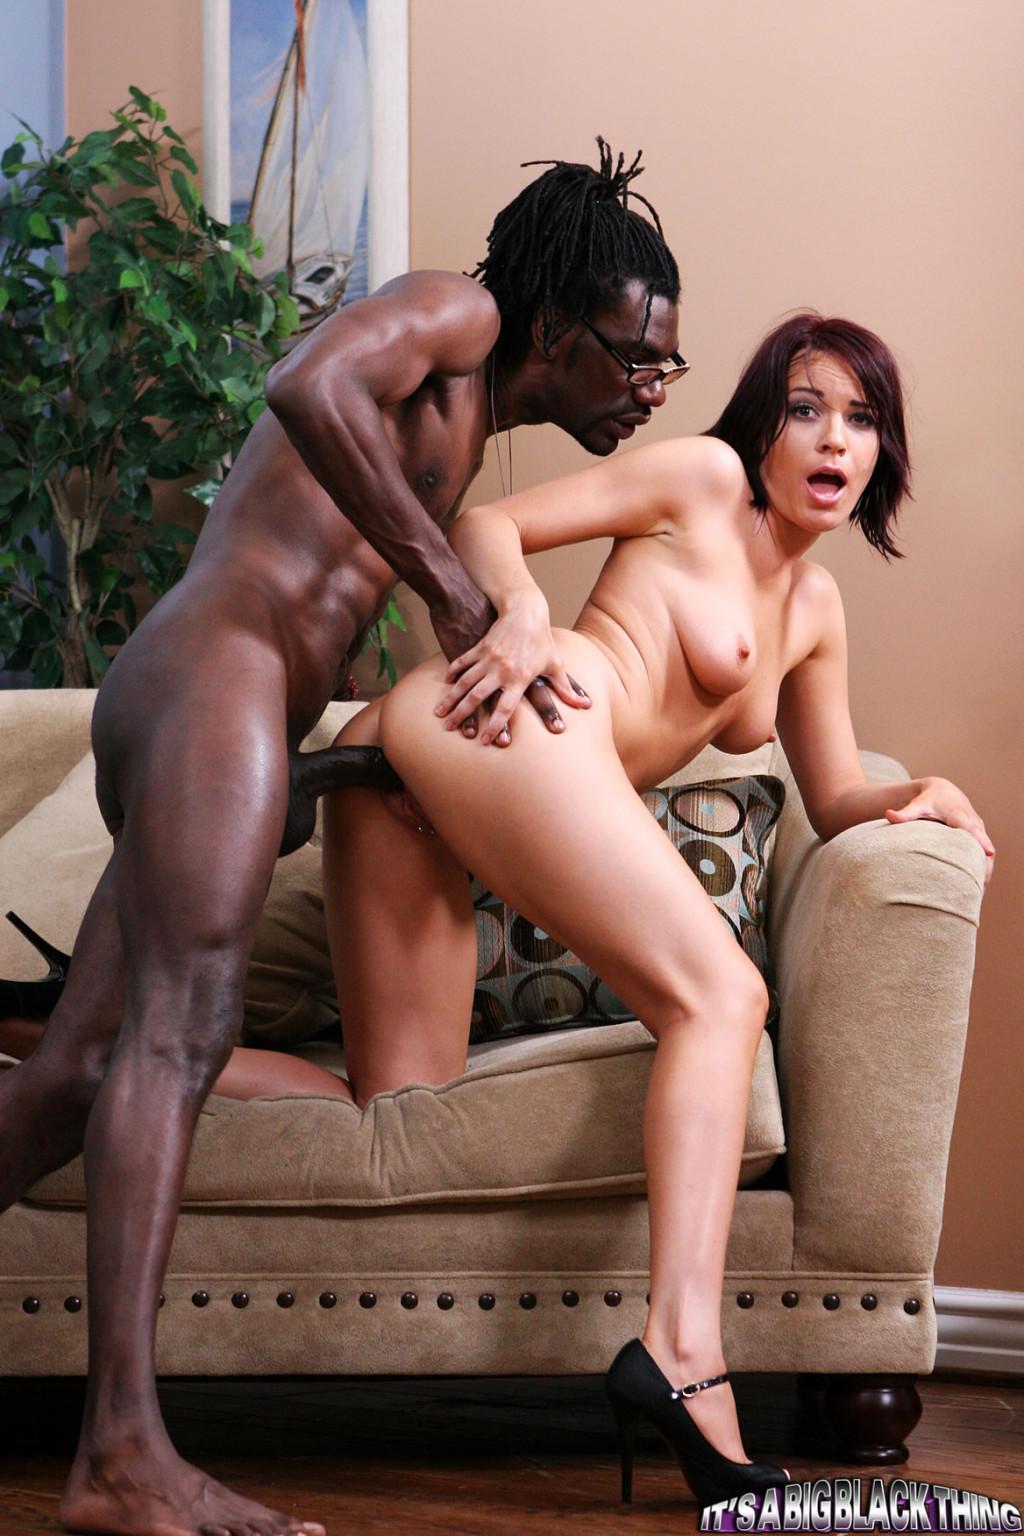 Women female erotic vomitting